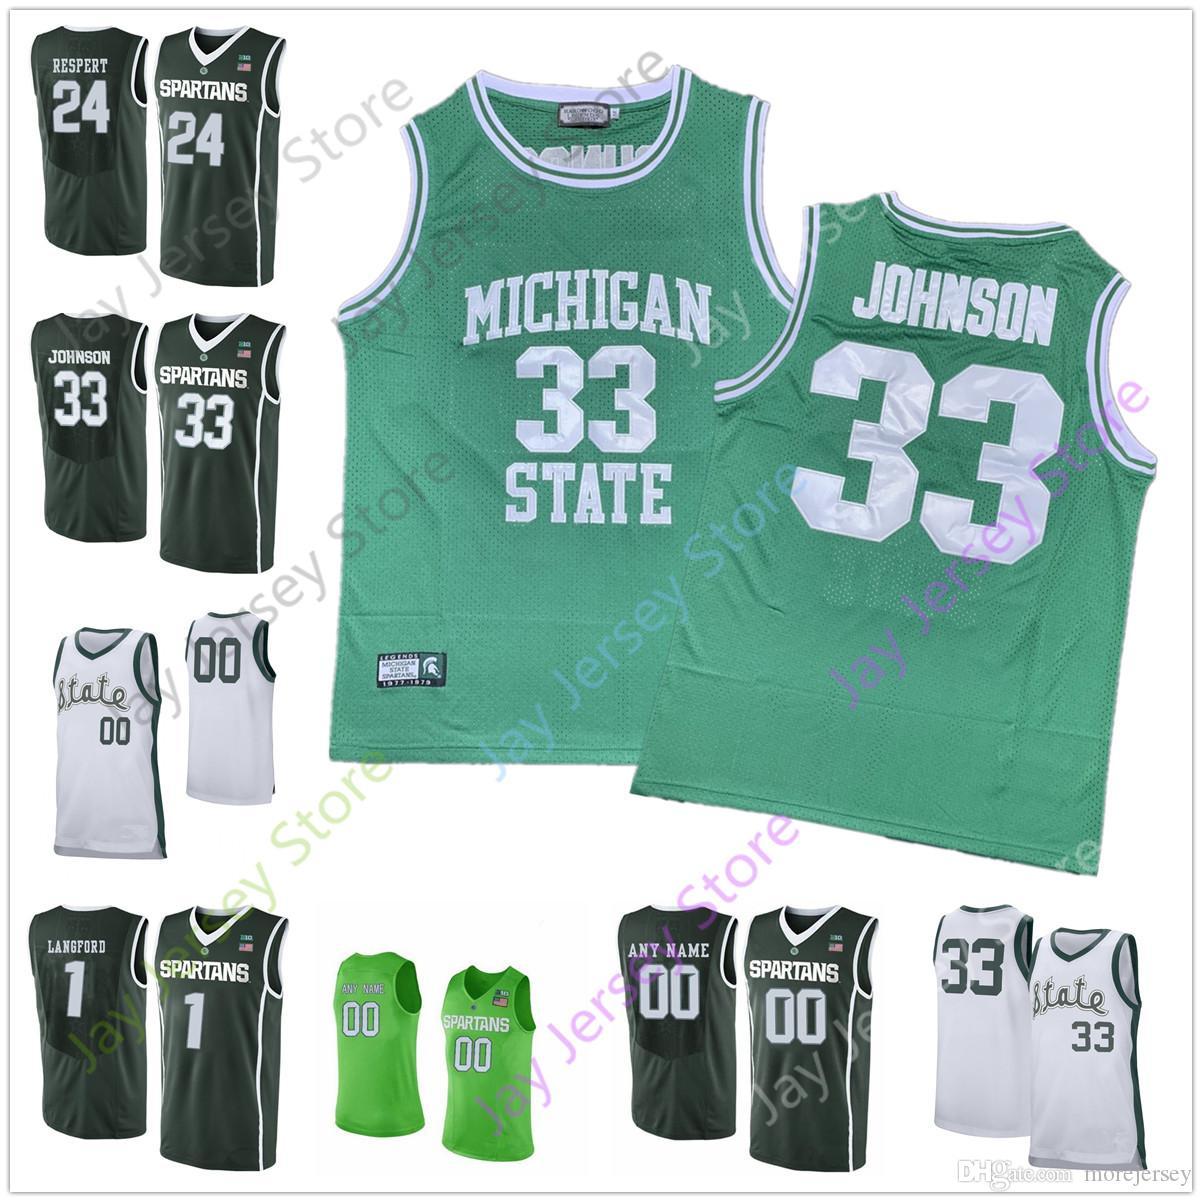 Personnalisé Michigan State Basketball Jersey College 33 Johnson 50 Randolph 23 Richardson 23 Vert